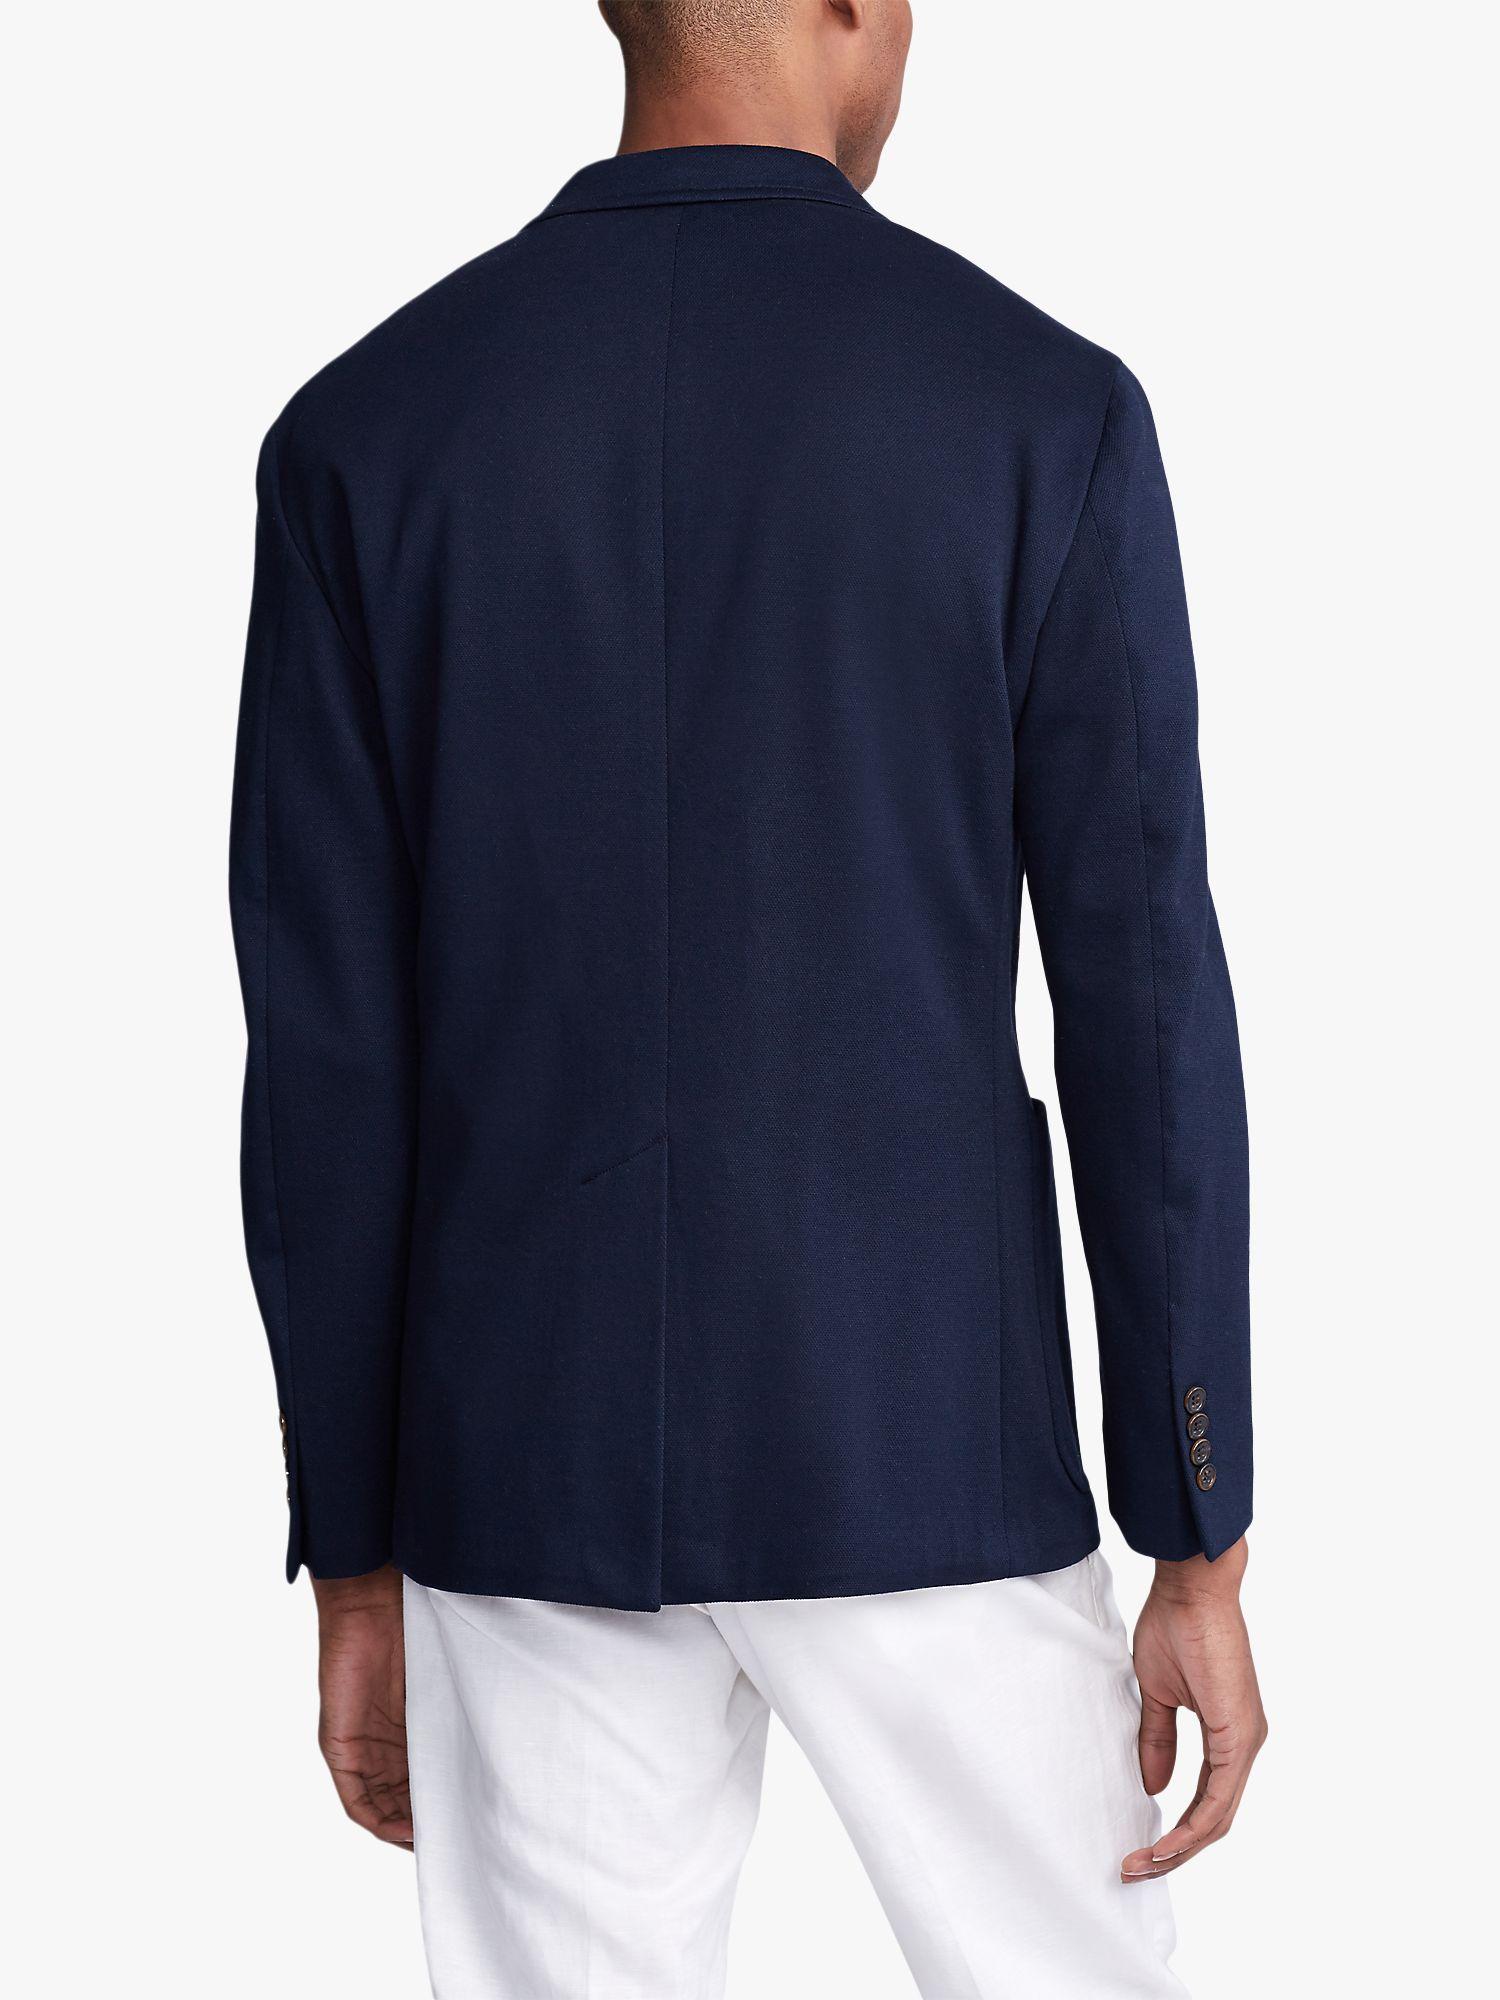 Polo Ralph Lauren Knit Mesh Cotton Blazer Navy In 2020 Cotton Blazer Polo Ralph Lauren Polo Ralph